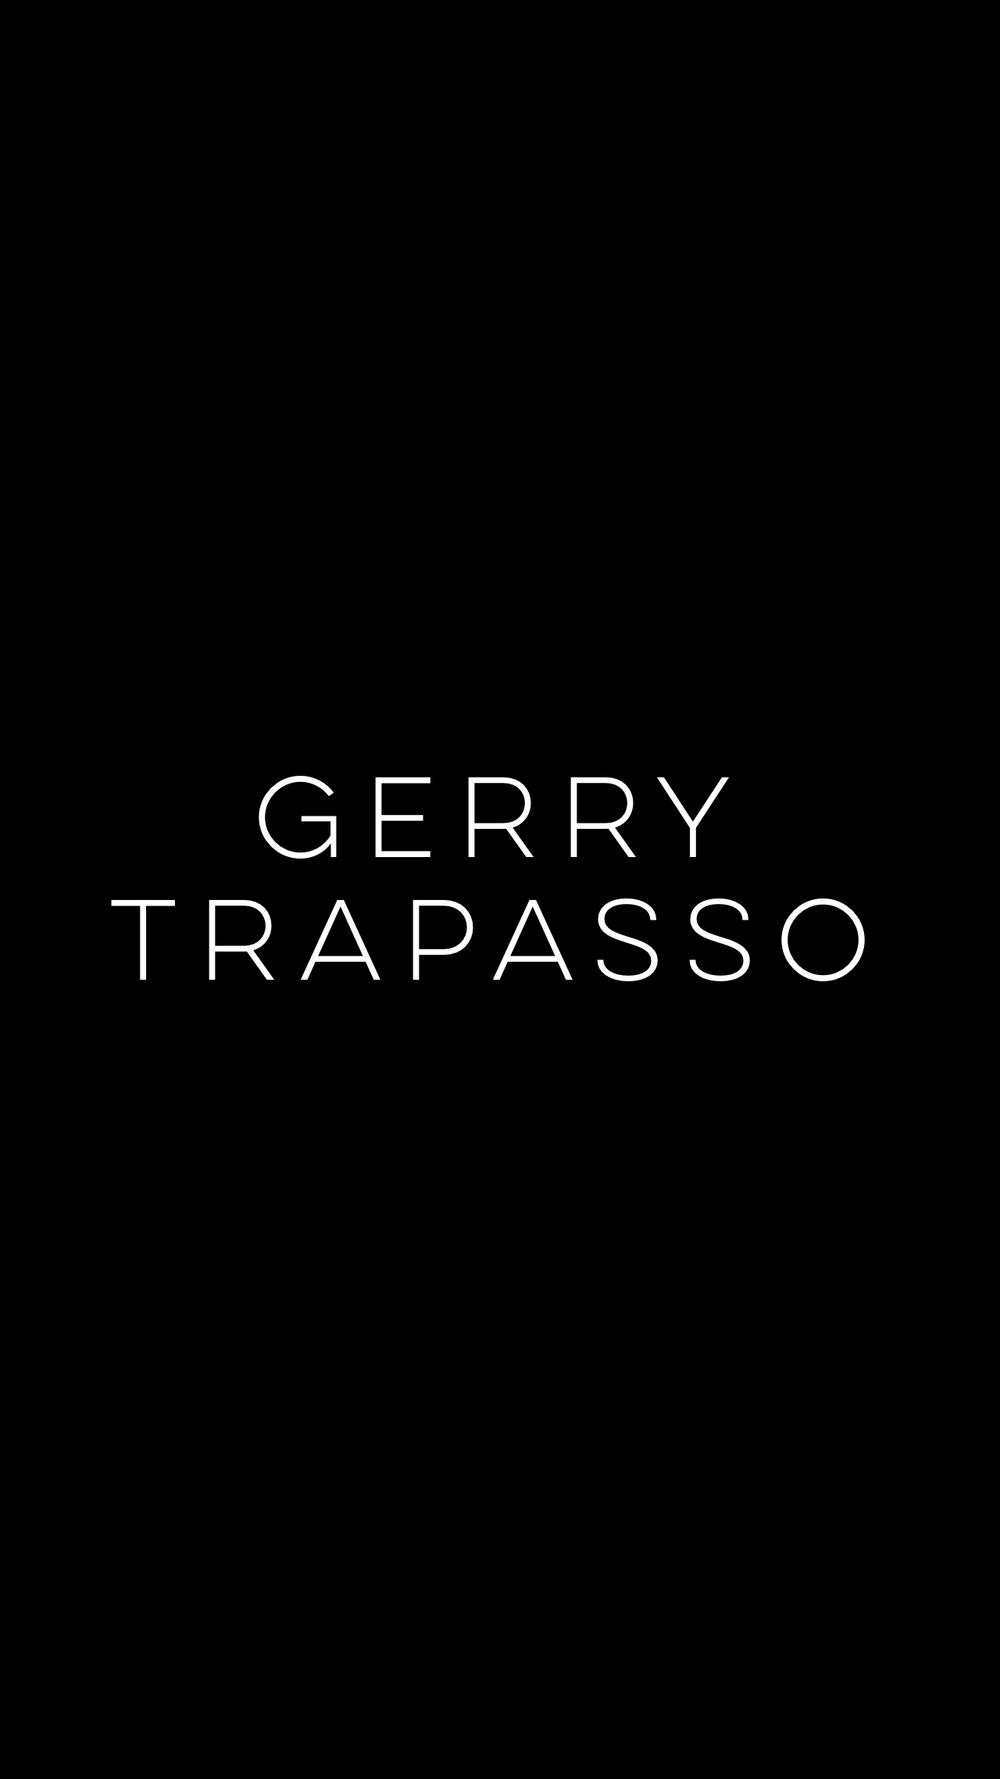 GERRY TRAPASSO.jpg